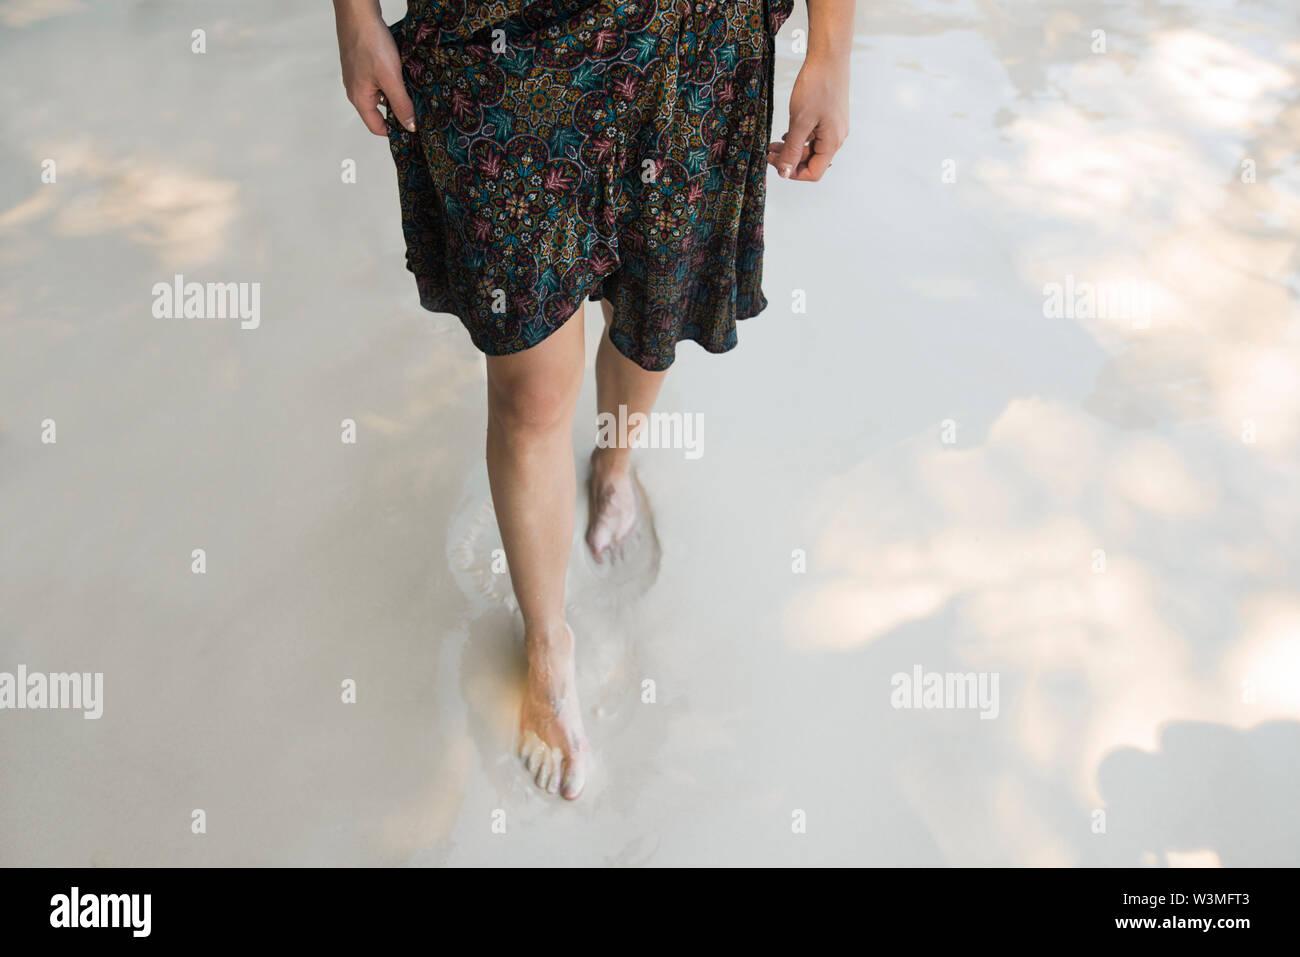 Legs of woman walking on beach - Stock Image